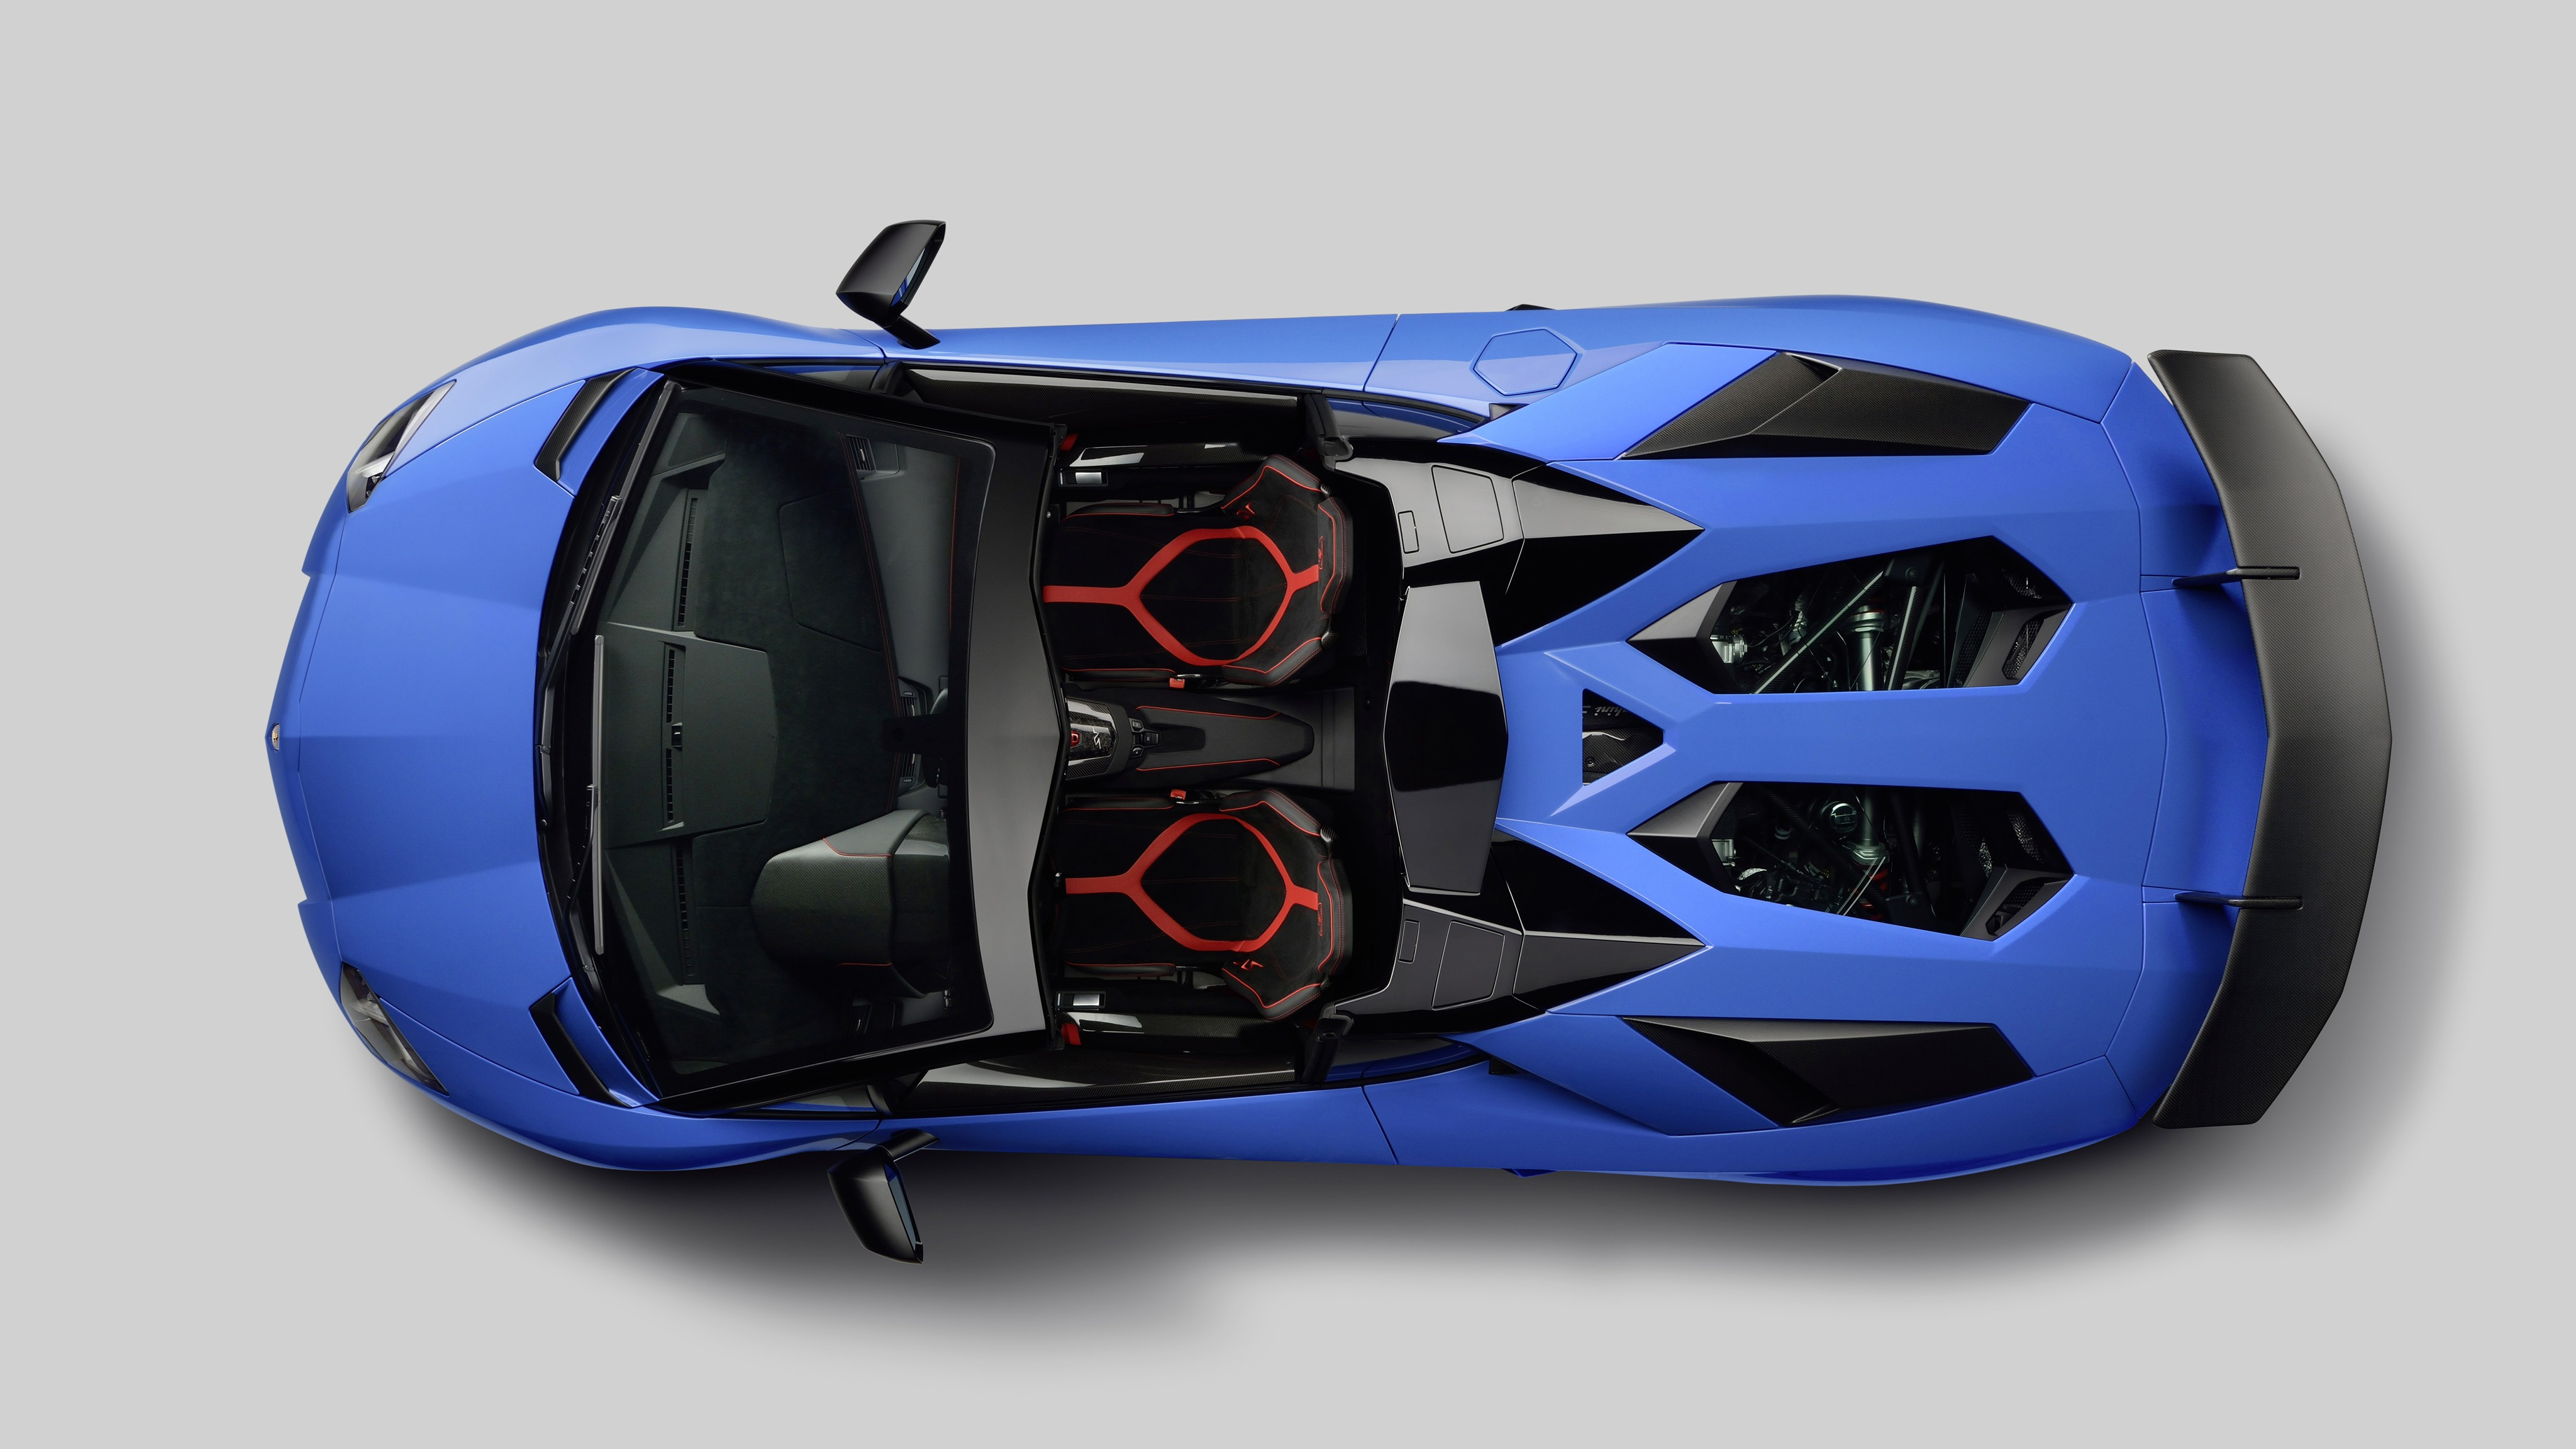 Lamborghini Aventador Lp750 4 Sv Roadster Specs Photos 2015